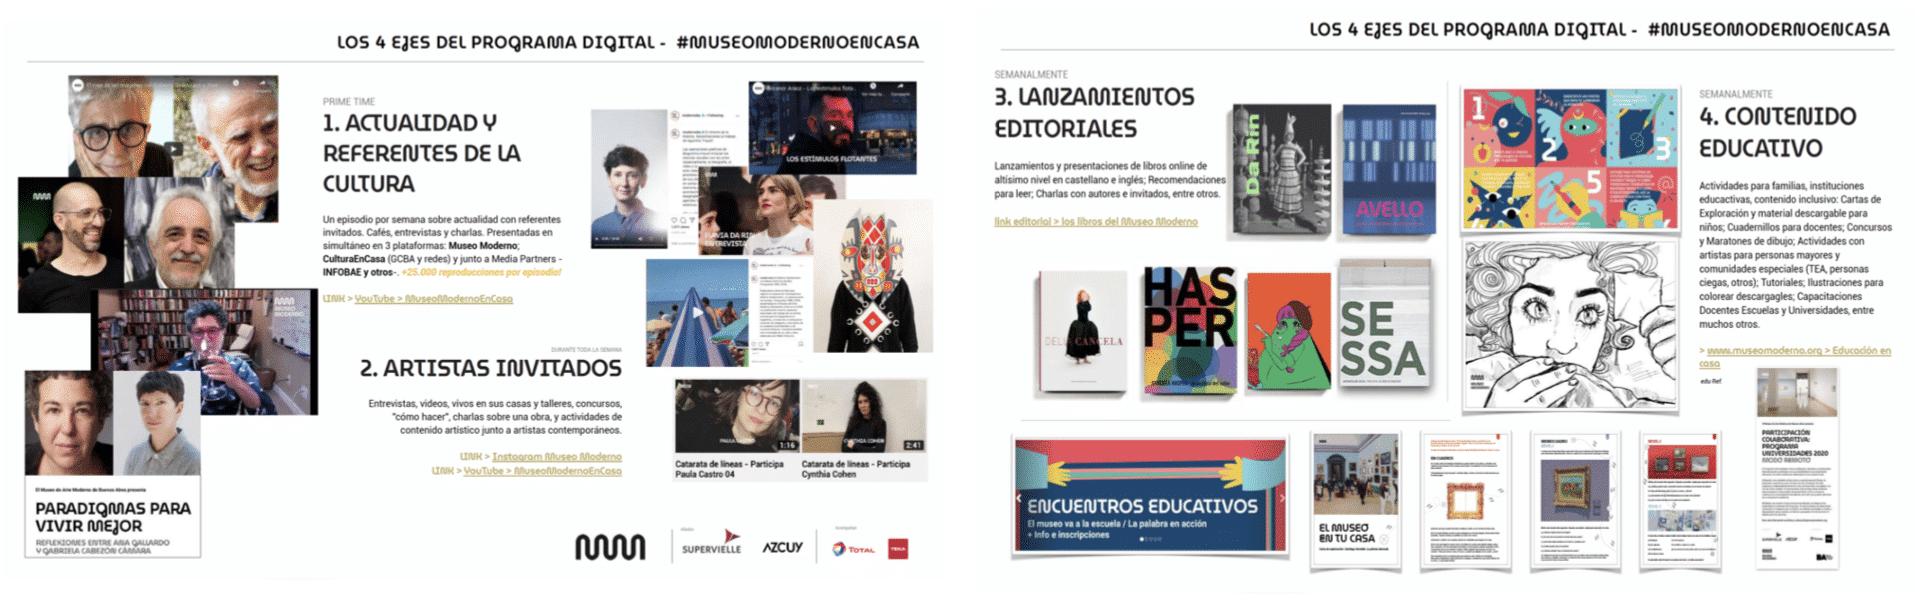 Digitales Programm von Museo de Arte Moderno, Buenos Aires